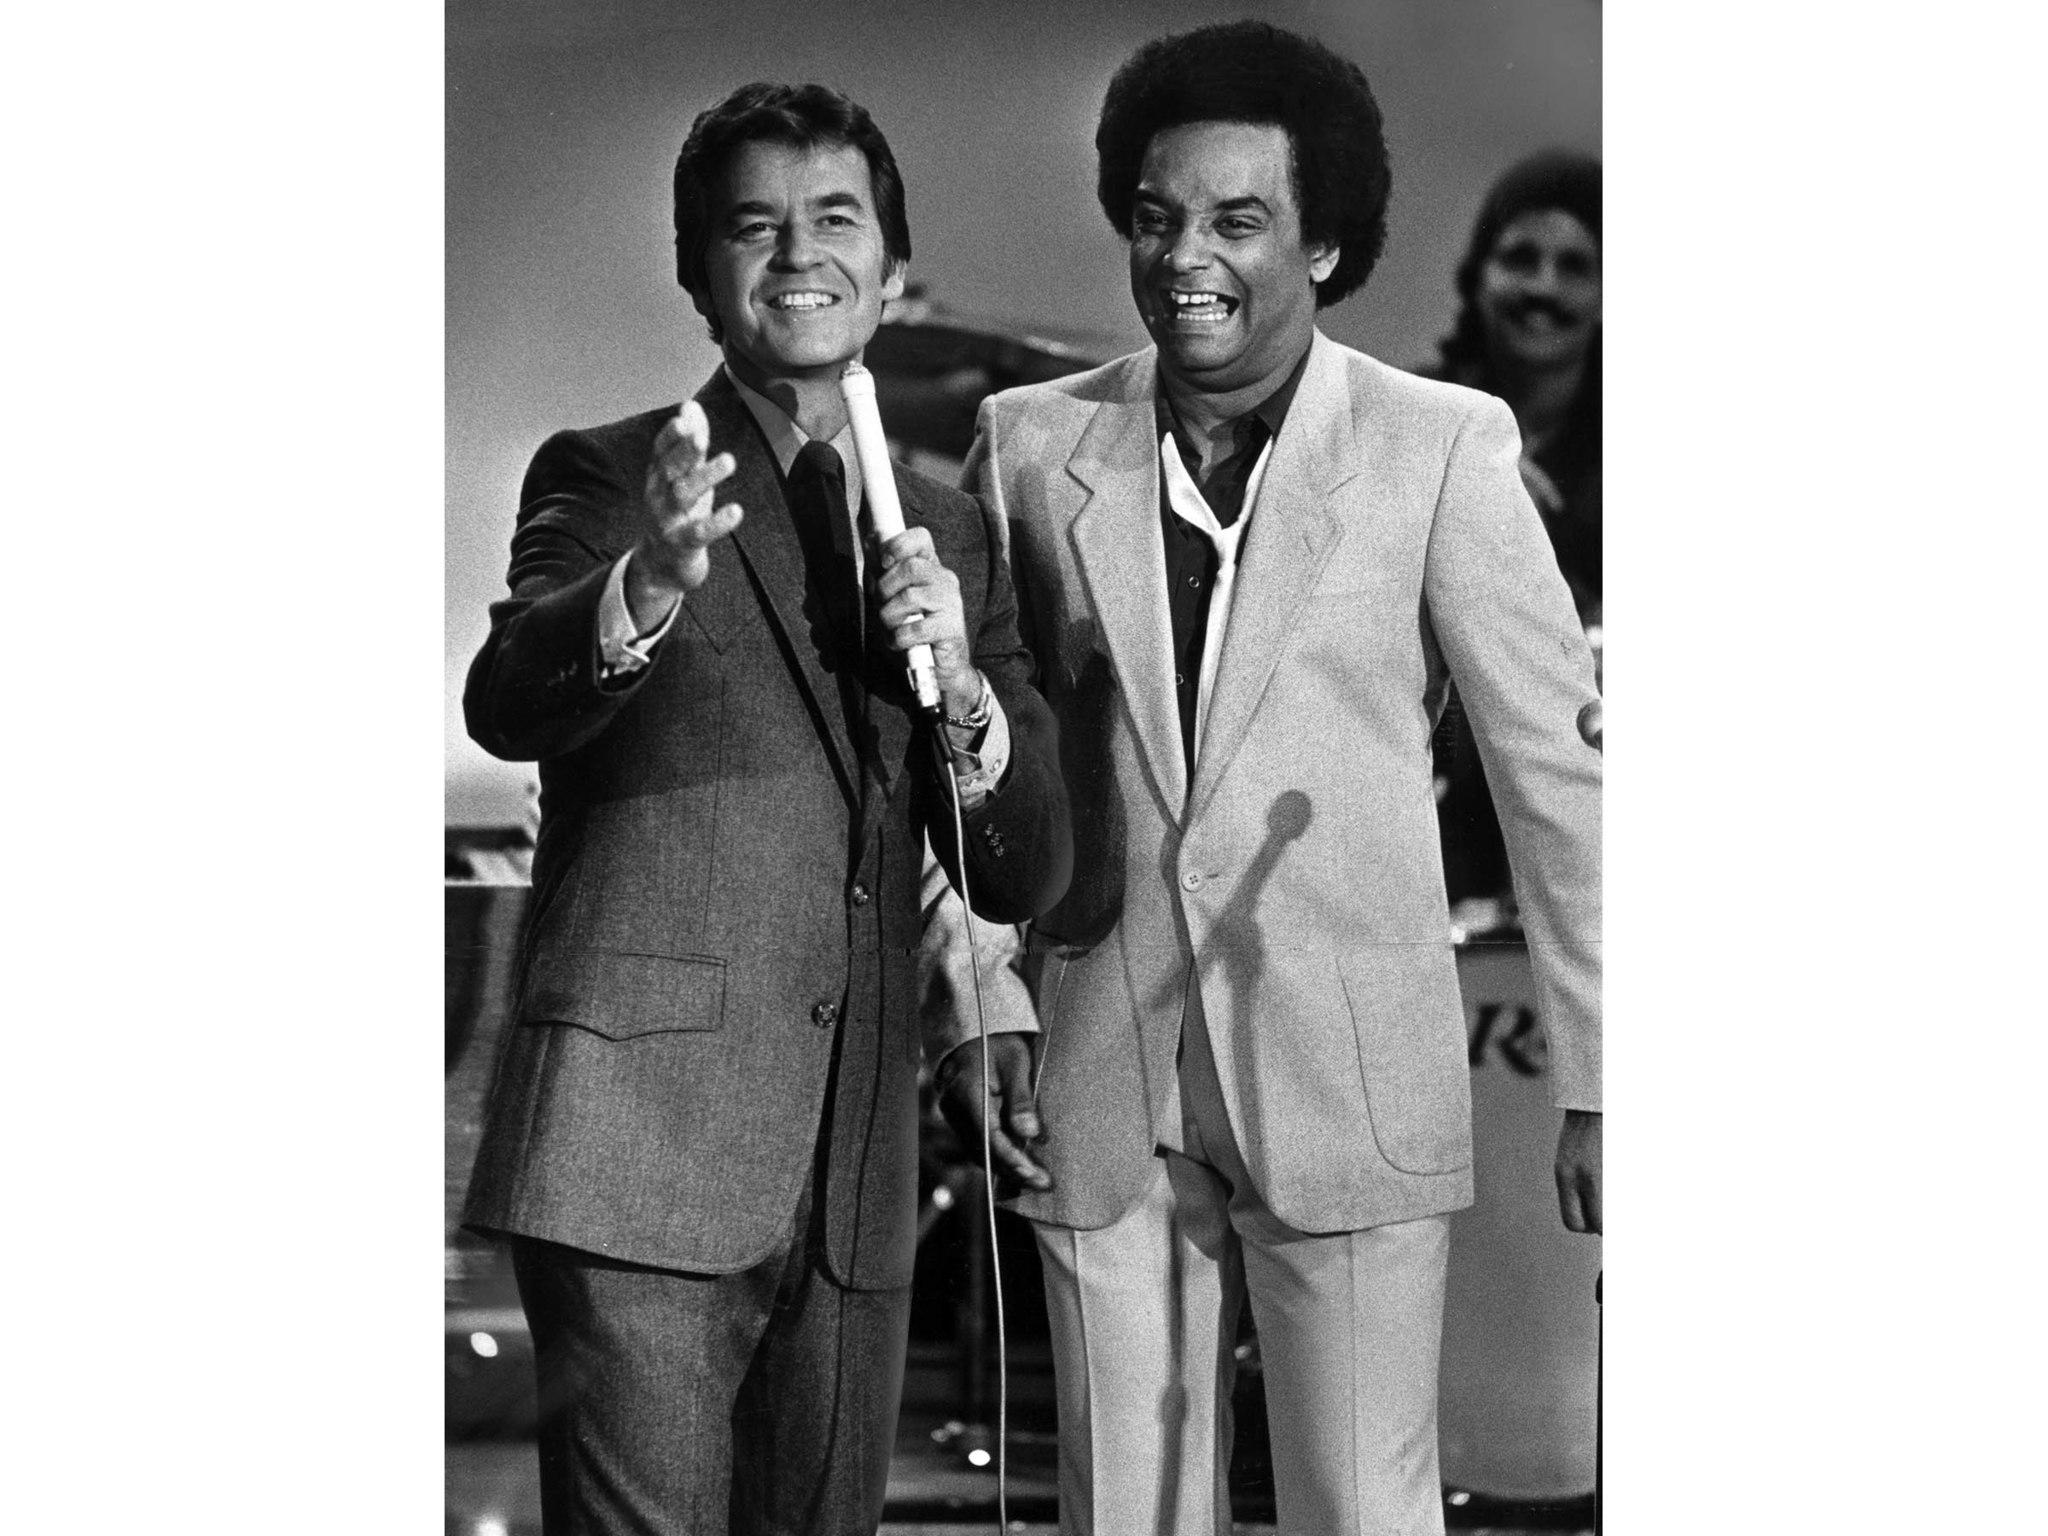 May 16, 1981: Dick Clark with rocker Gary U.S. Bonds, singer of 1961 hit